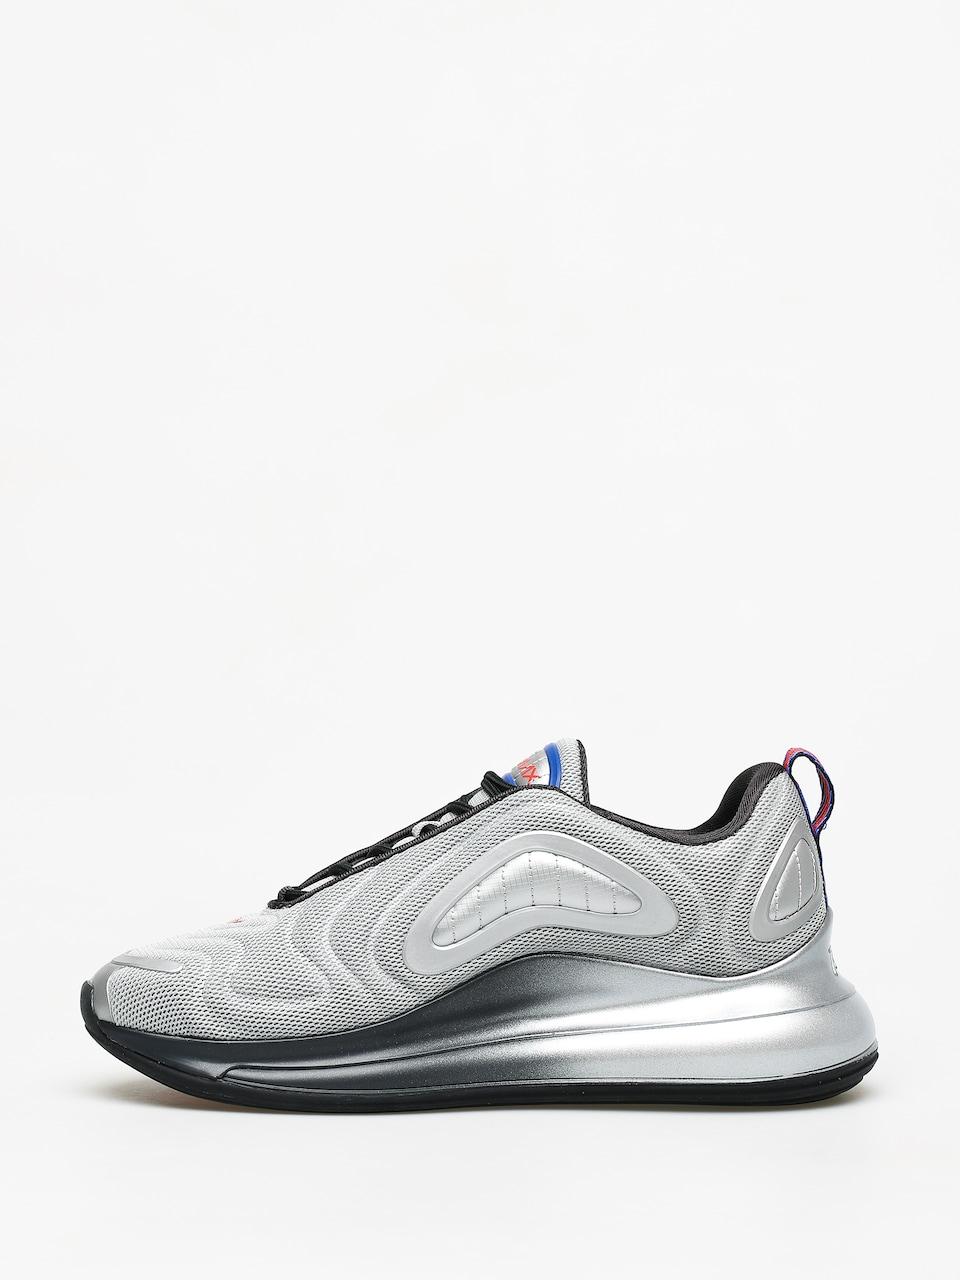 Buty Nike Air Max 720 (metallic silveroff noir cosmic clay)